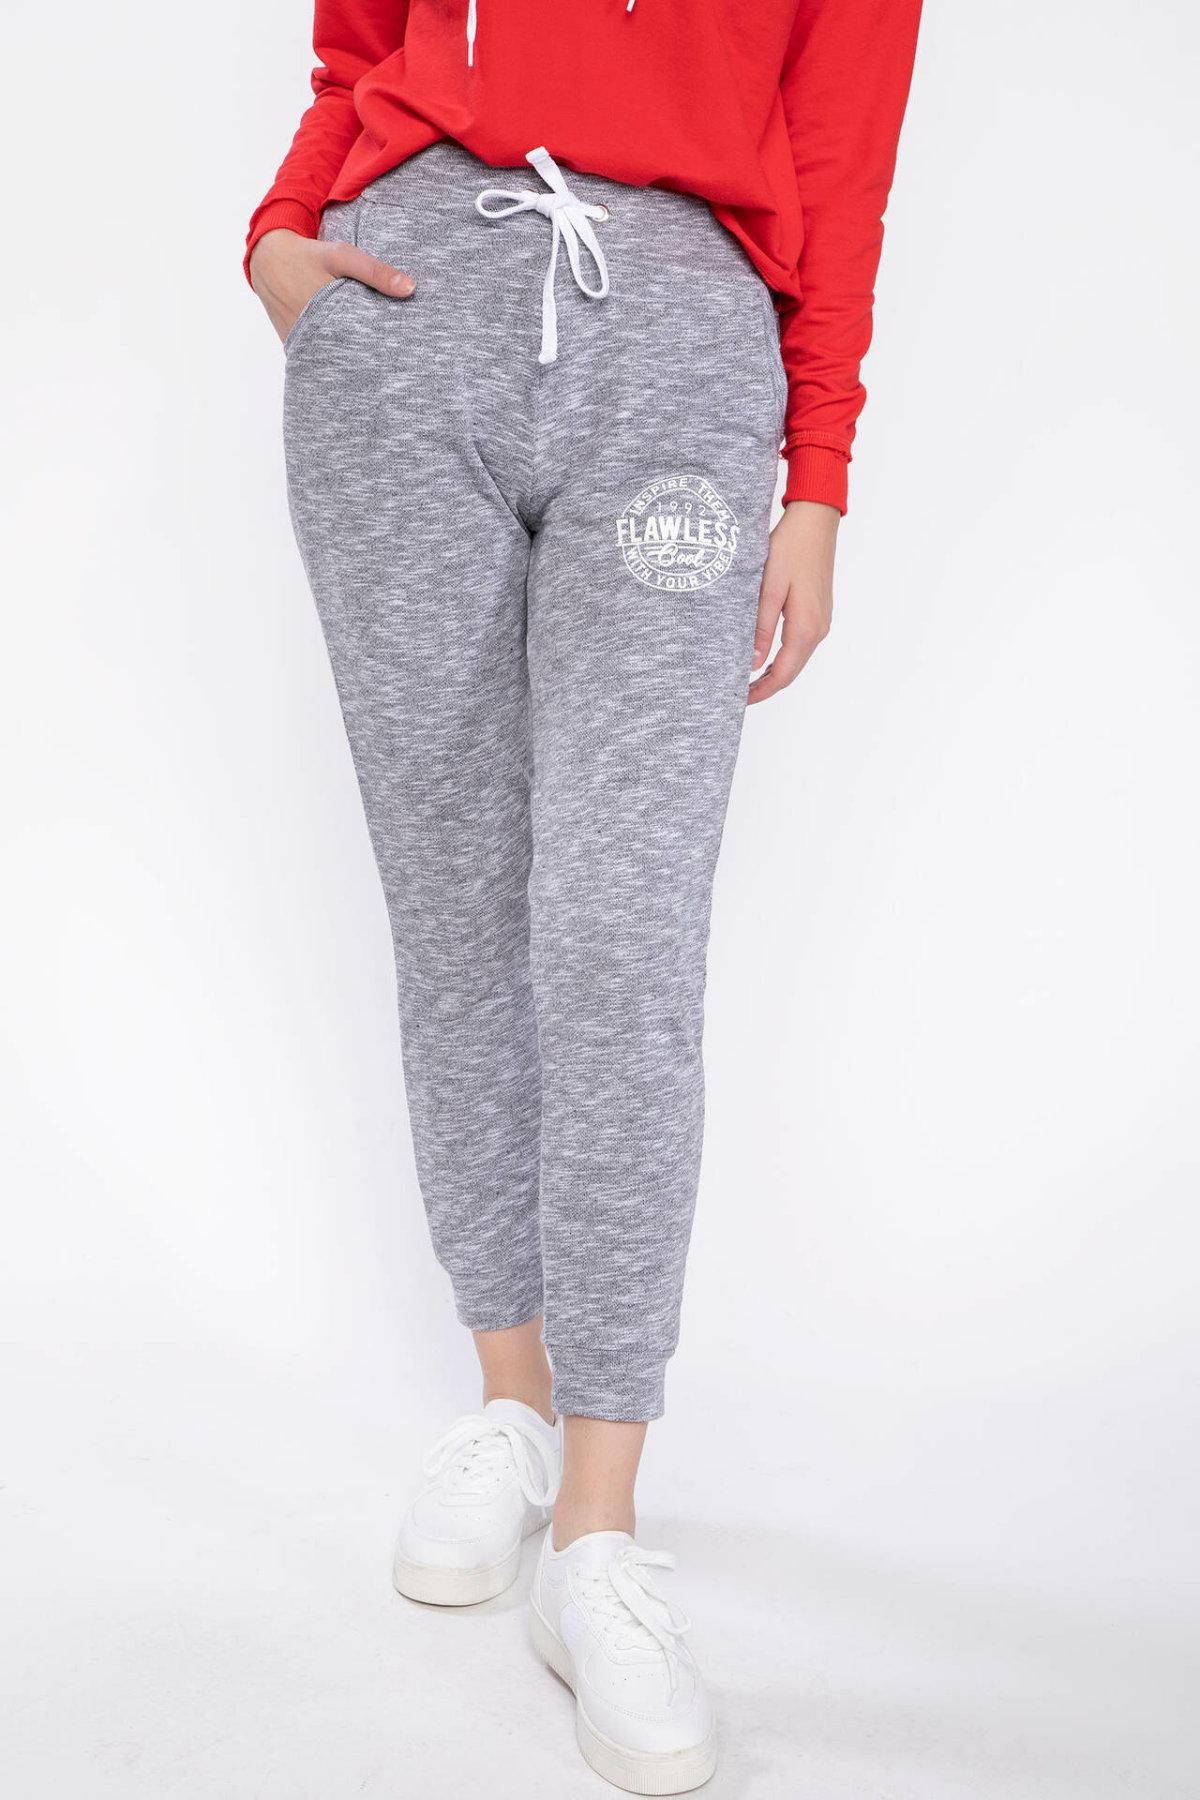 DeFacto Fashion Women Casual Jogger Pants Female Loose Drawstring Sweatpant Gray Sports Crop Trousers Ladies-J3329AZ18AU